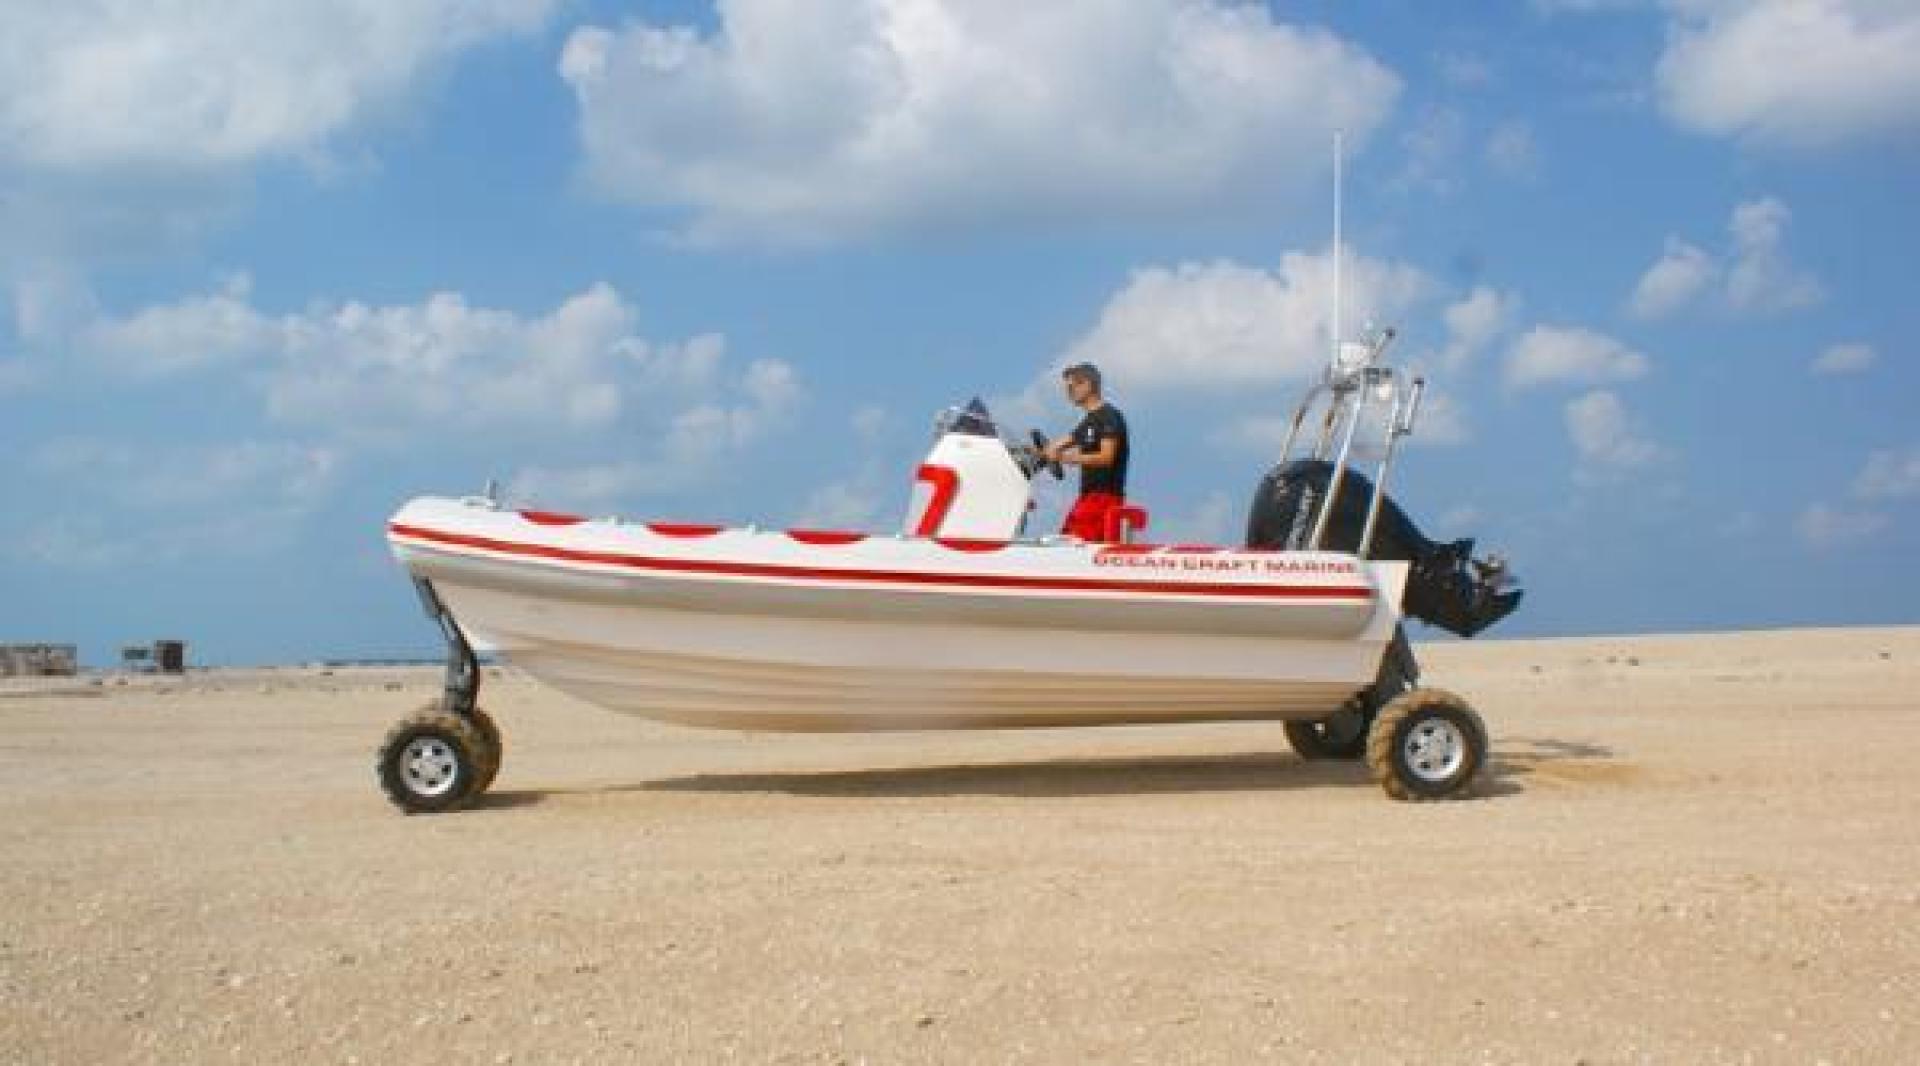 Ocean Craft Marine-7.1 M Amphibious 2021-Ocean Craft Marine 7.1 M Amphibious Fort Lauderdale-Florida-United States-1523214 | Thumbnail